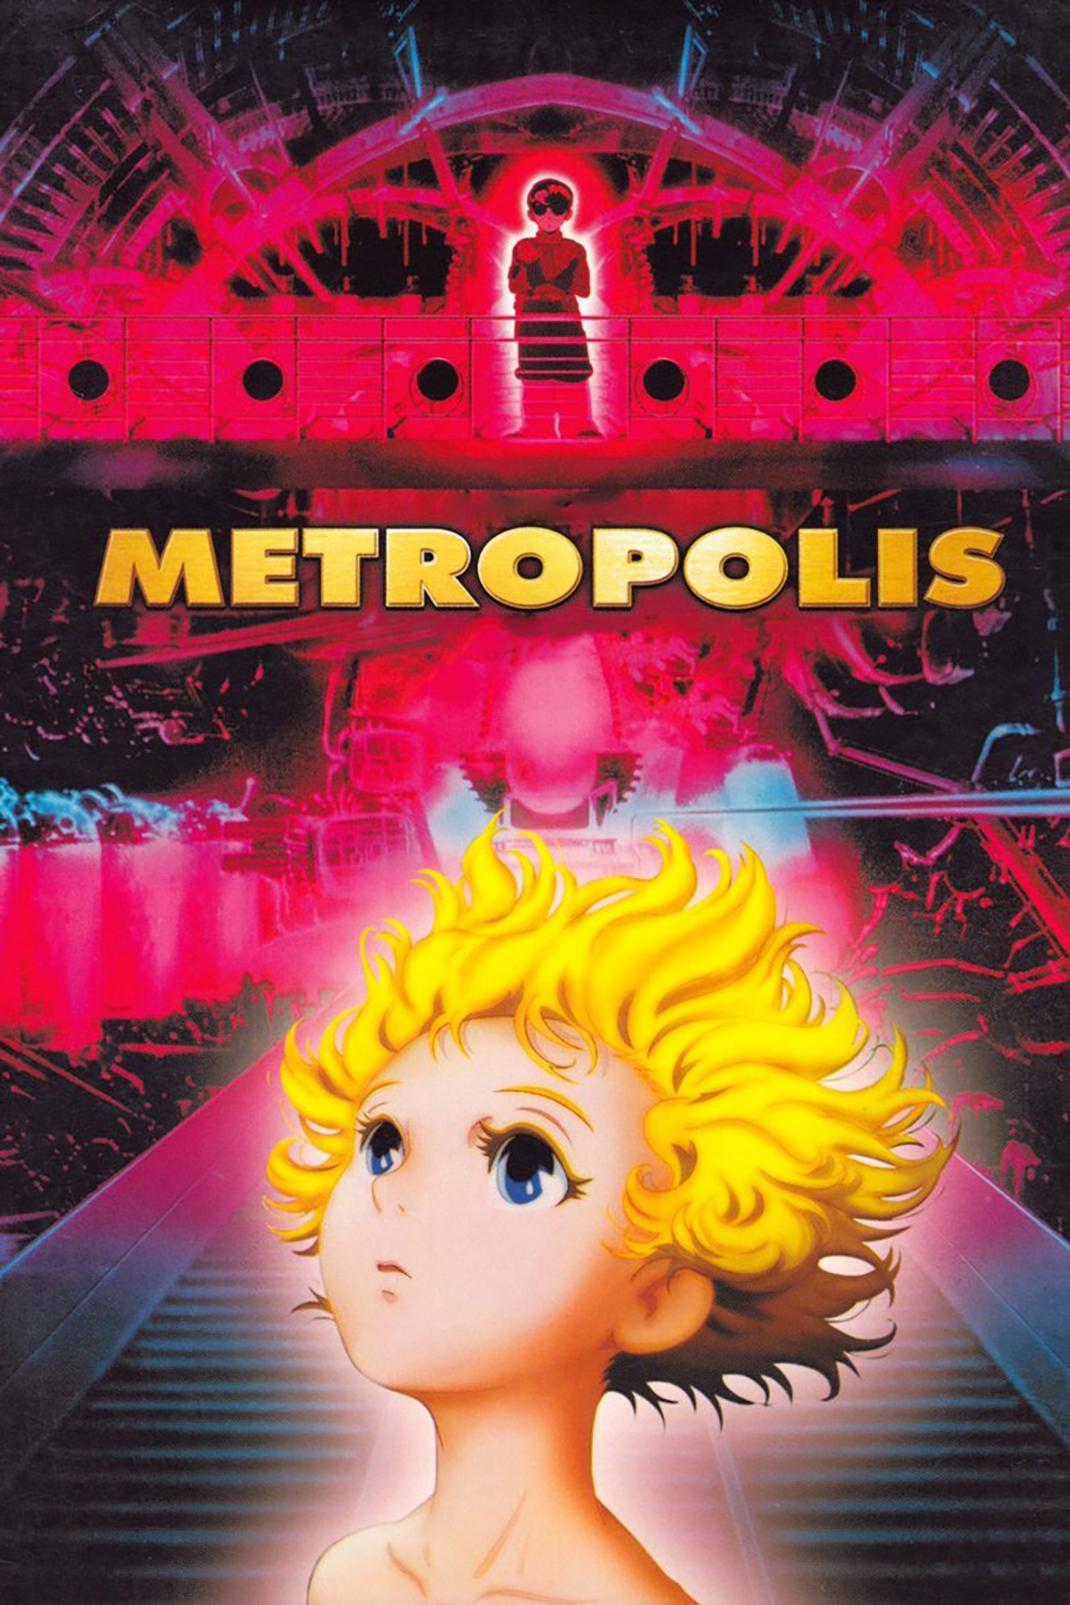 Metropolis 2001 Poster